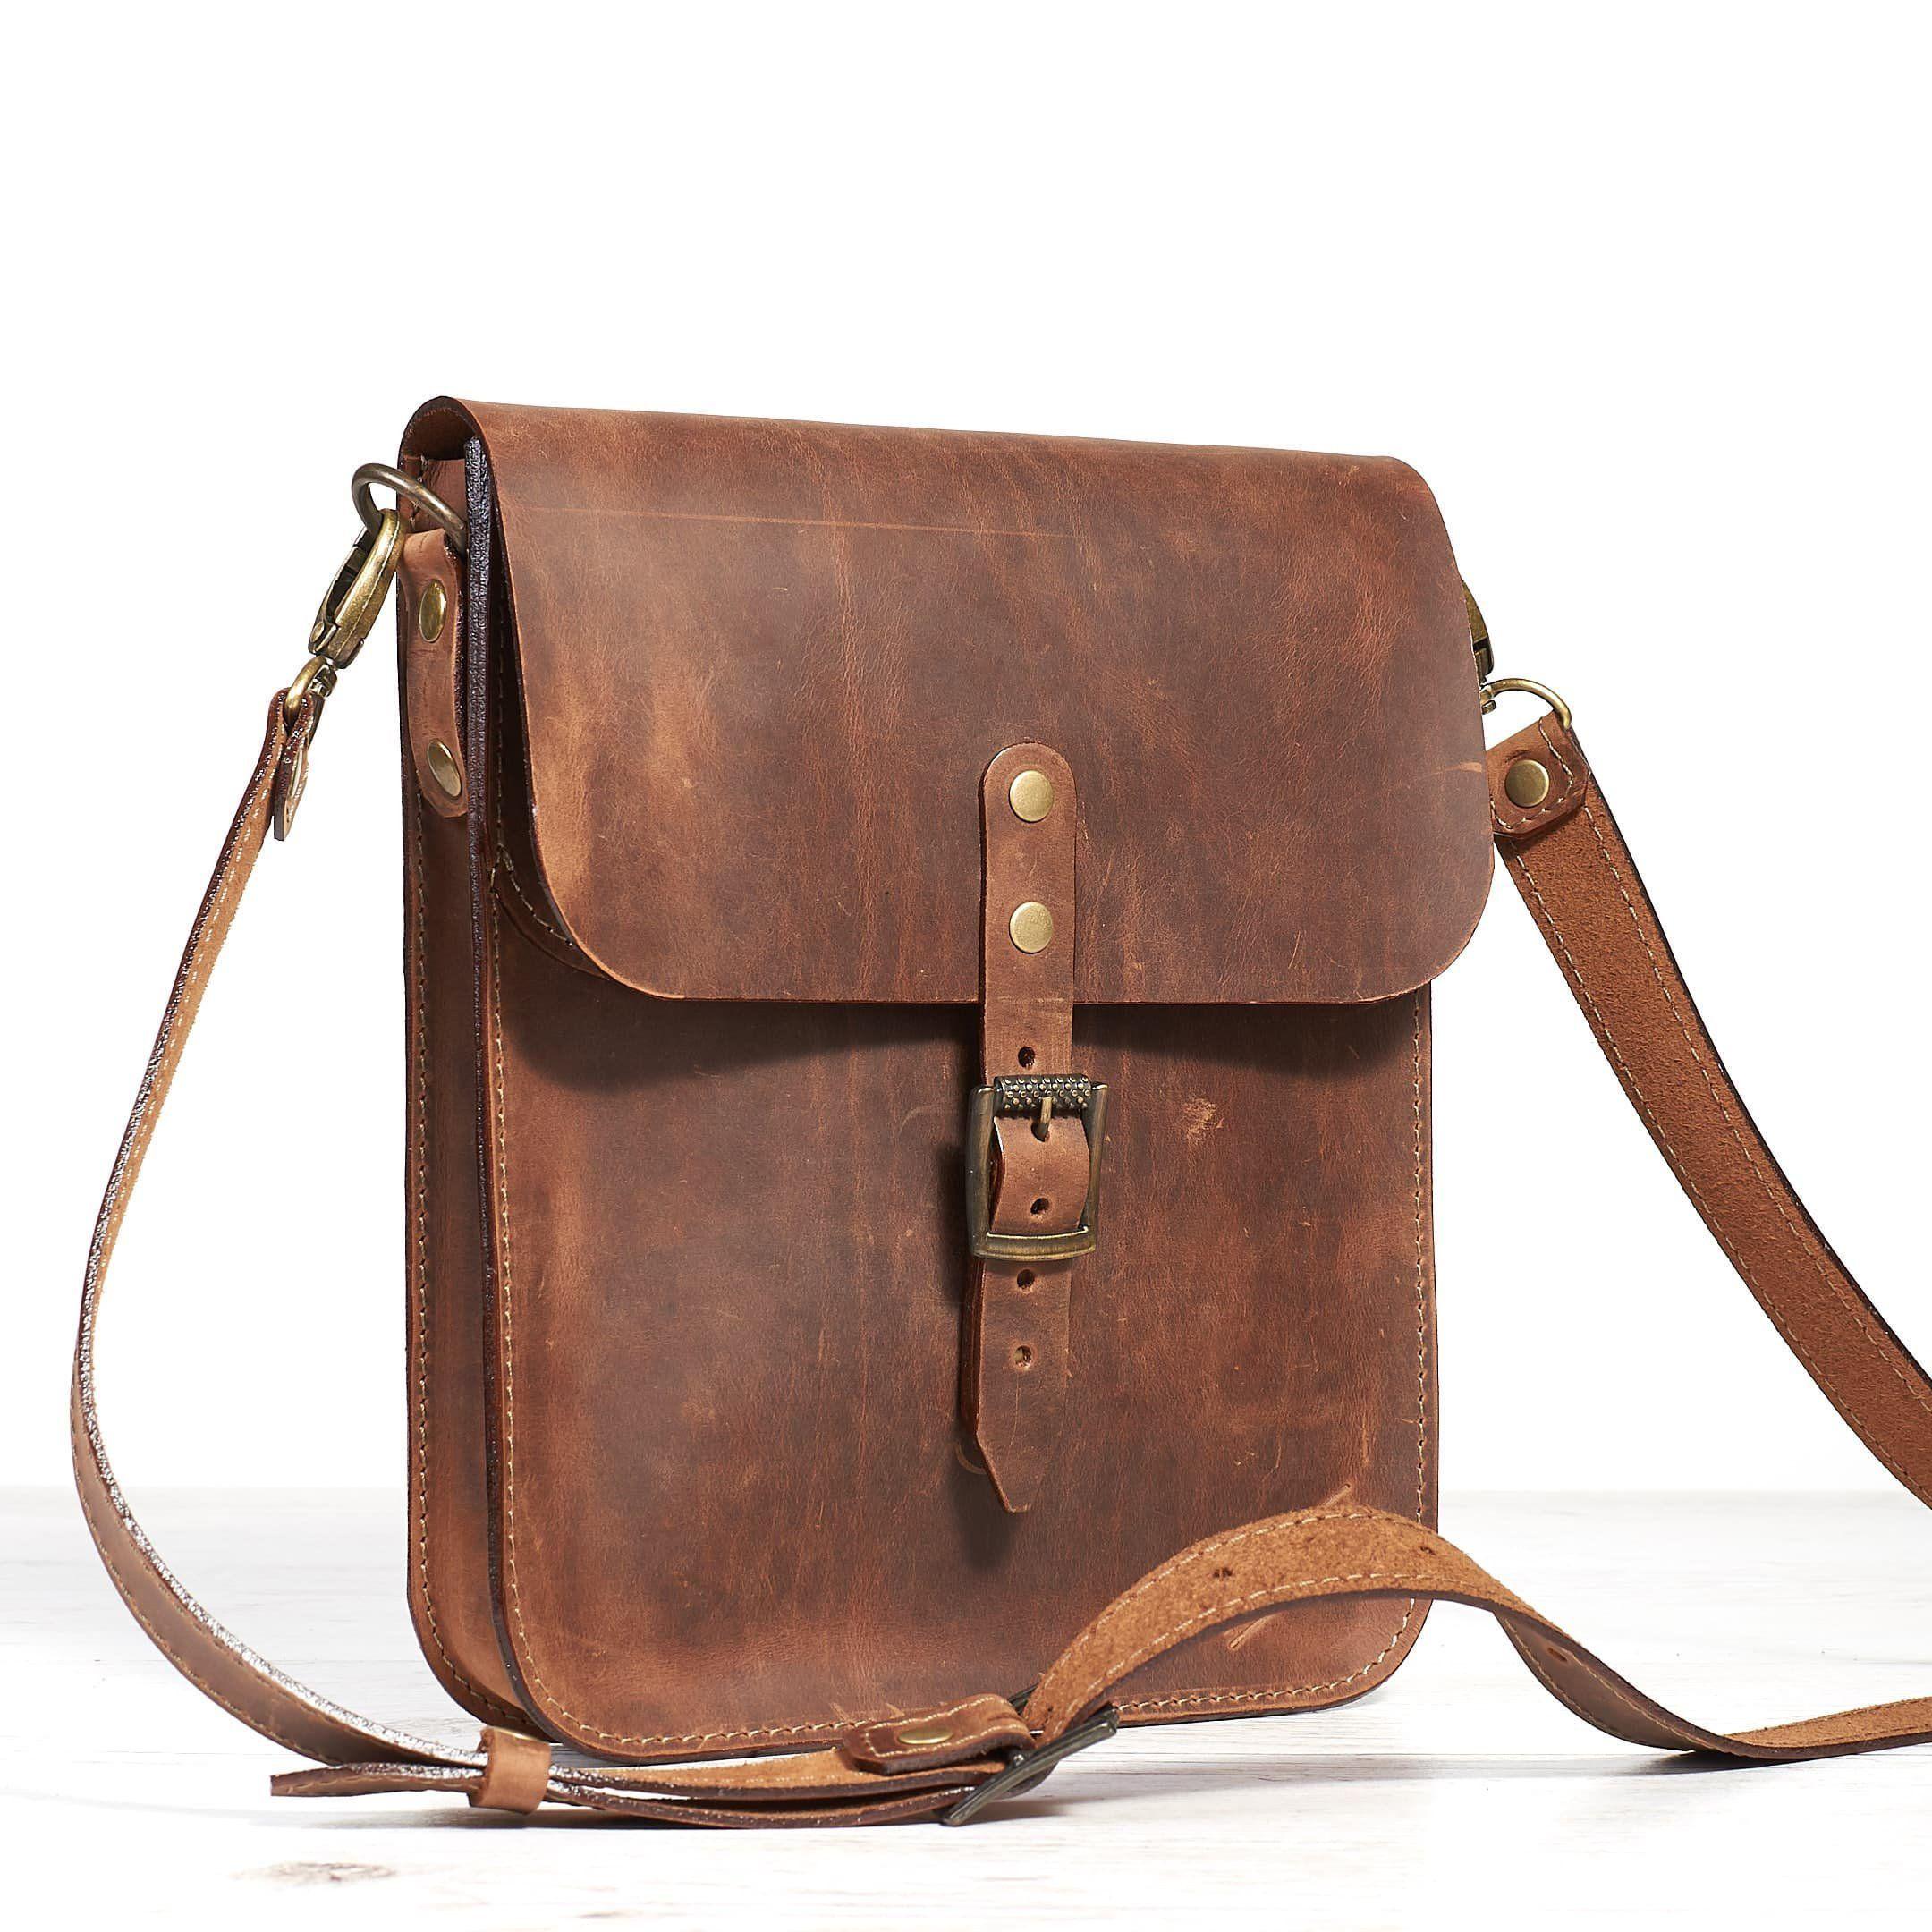 Bandolera de Hombre en Piel; Men/'s leather shoulder bag